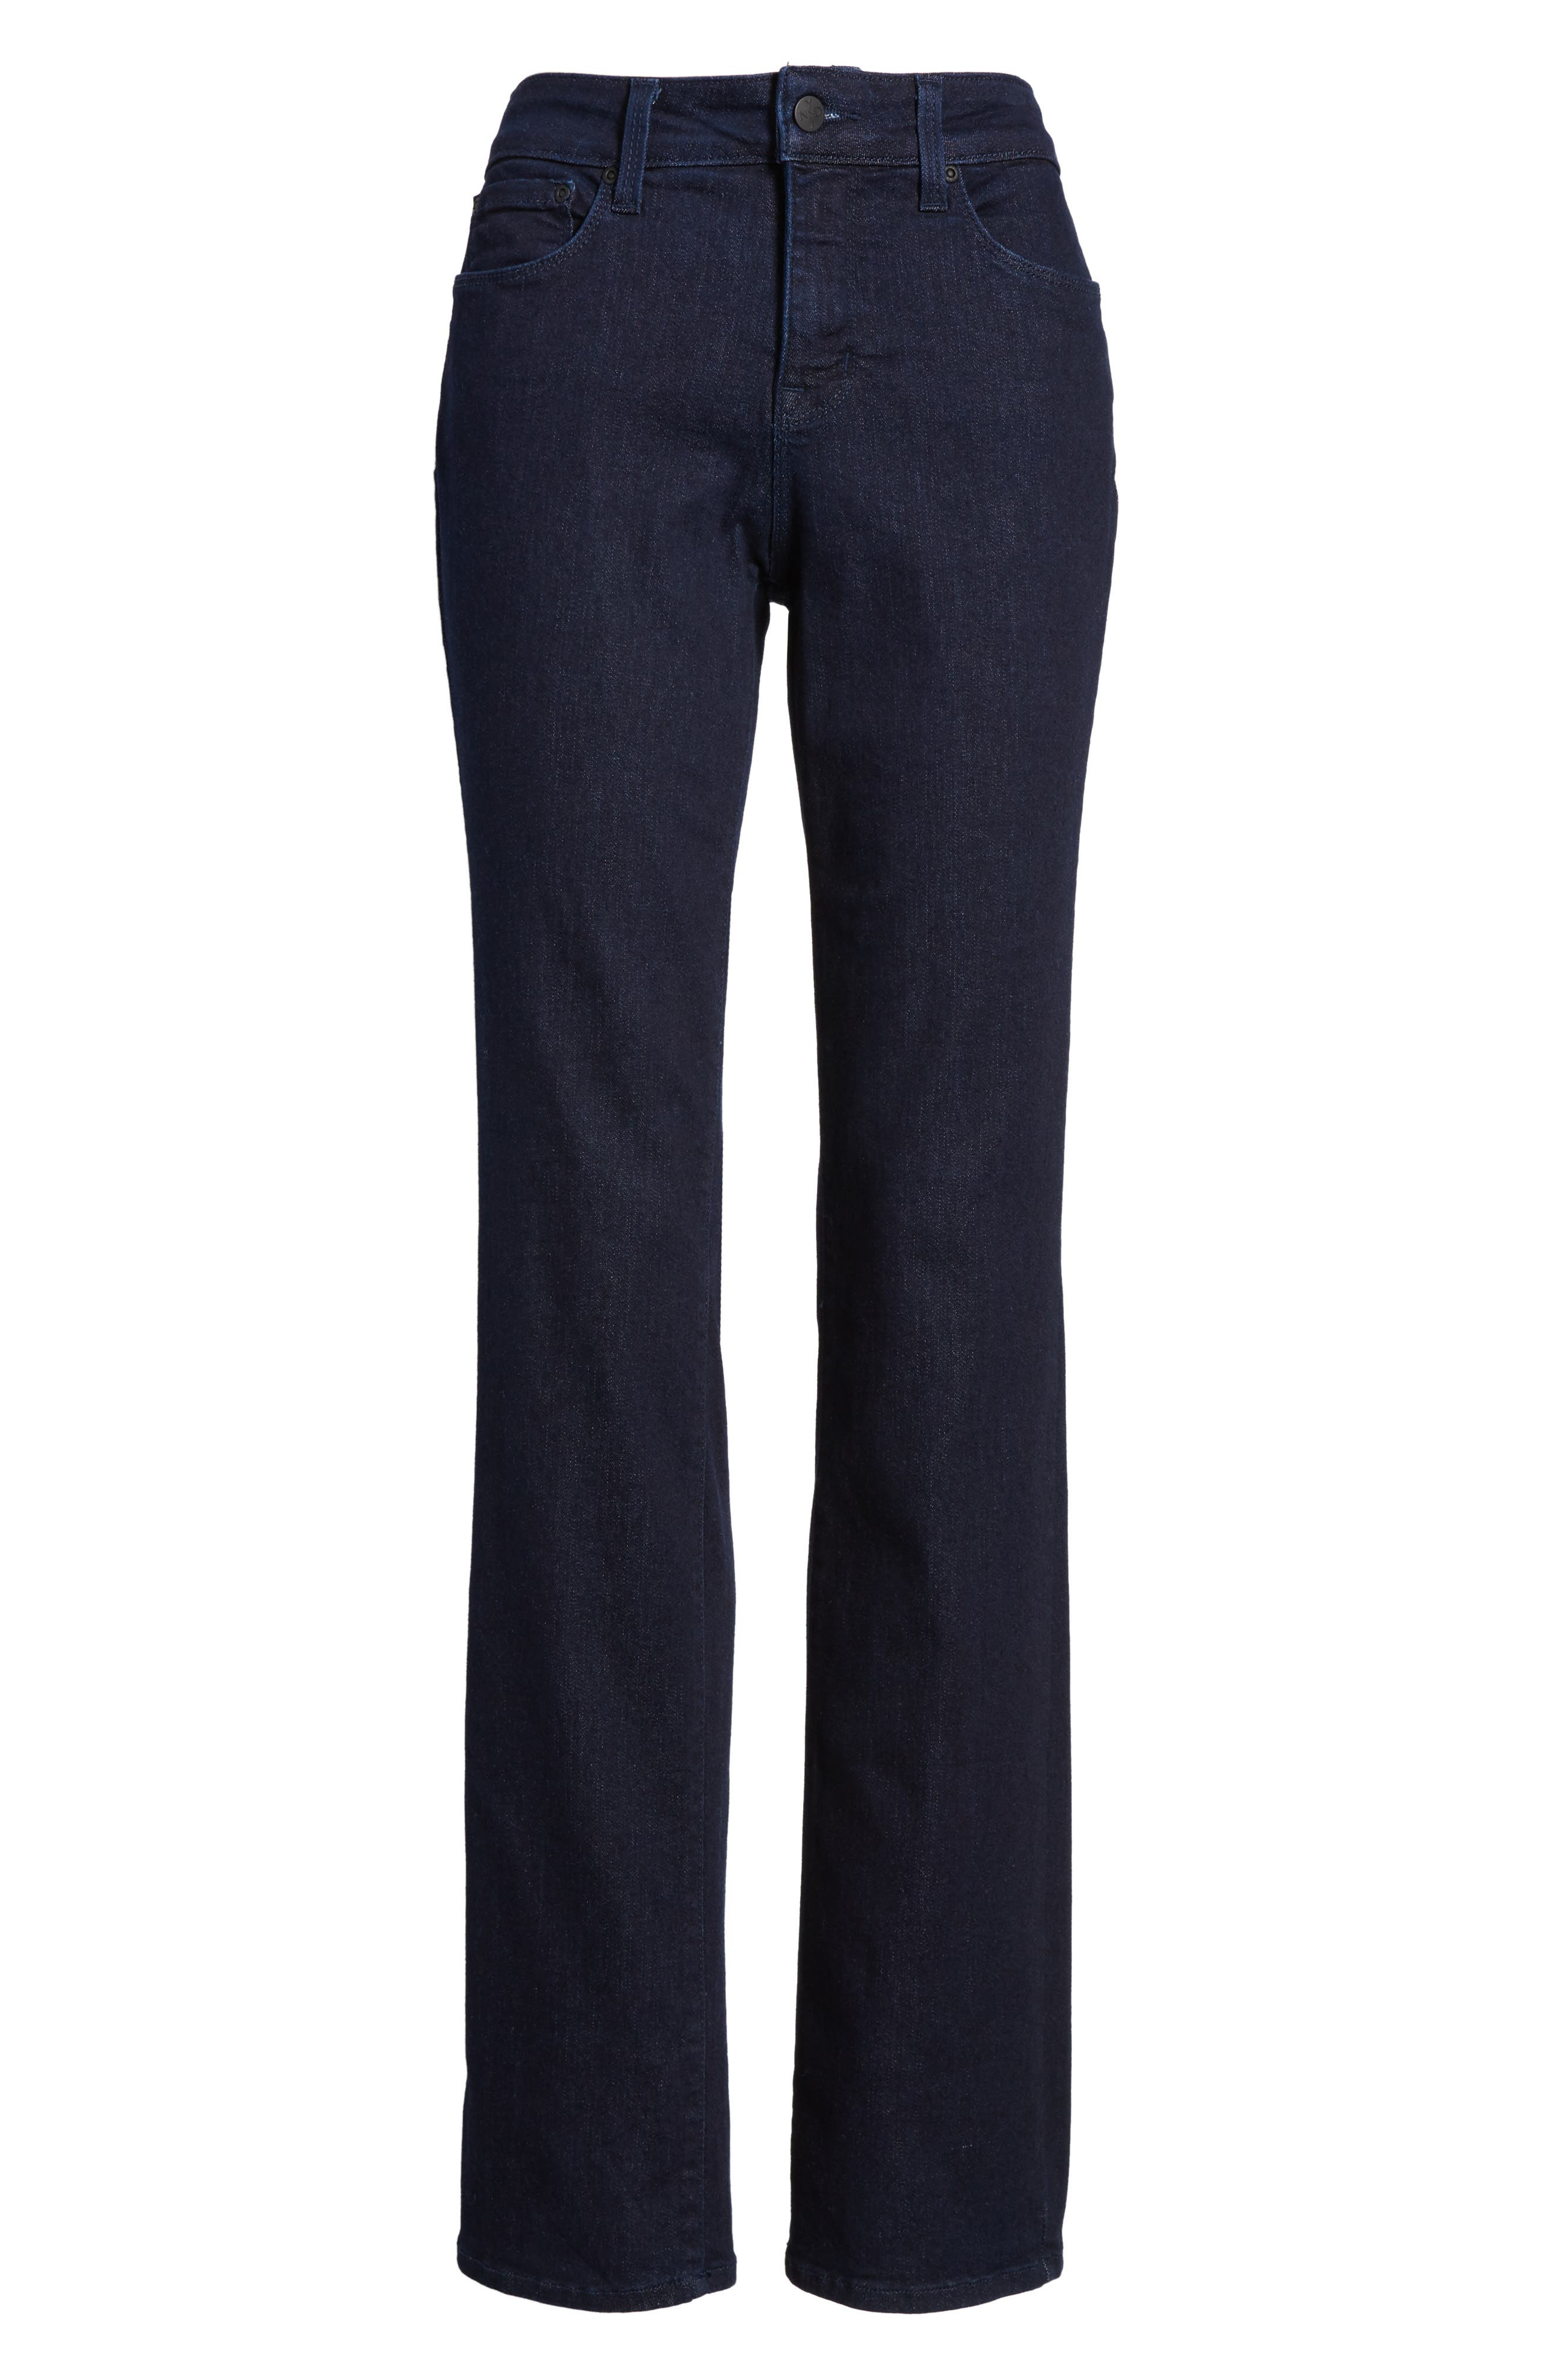 Marilyn Straight Leg Jeans,                             Alternate thumbnail 6, color,                             Rinse